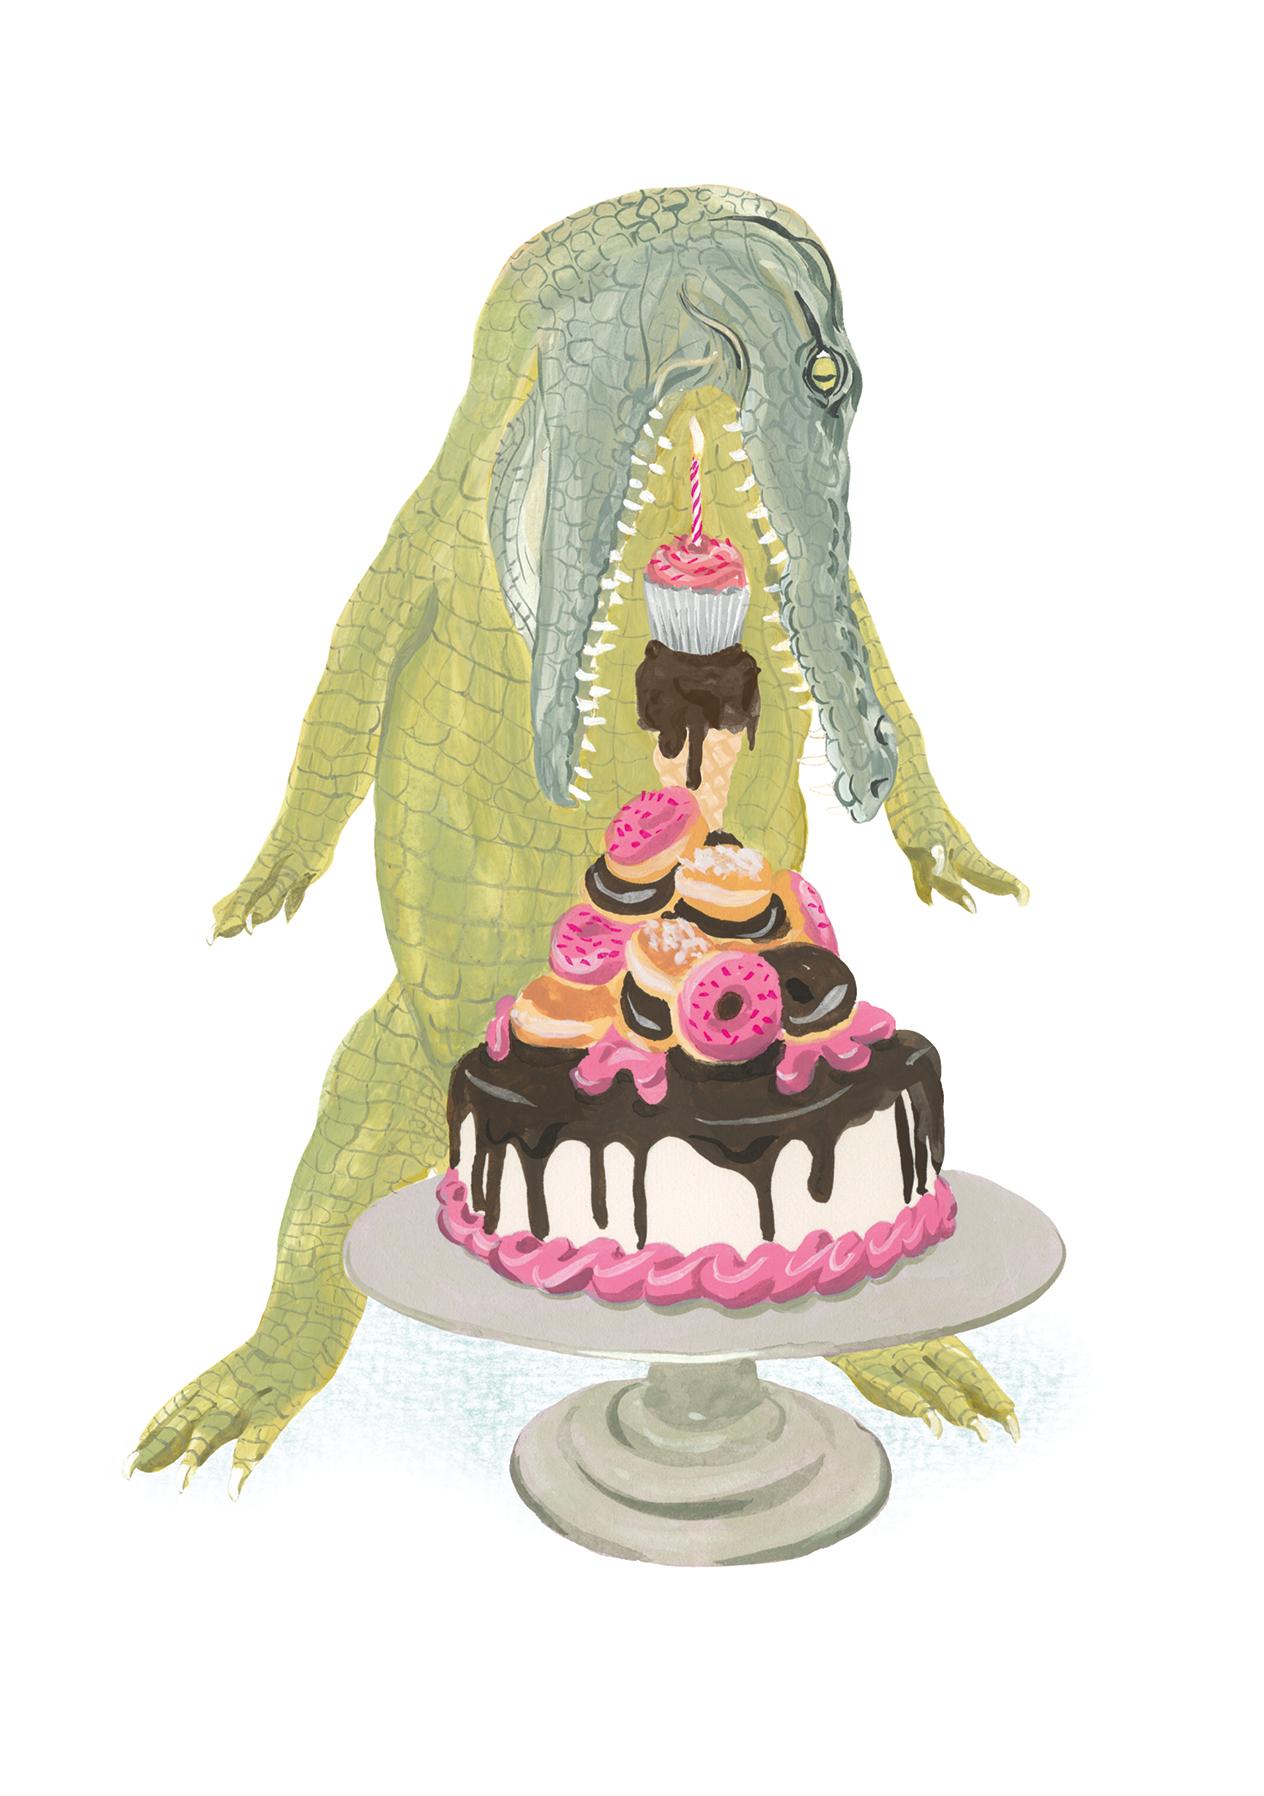 CCCA05 Animal Birthday Card Crocodile 5th Birthday Card 5th Birthday Card Child Birthday Card Fun Birthday Card